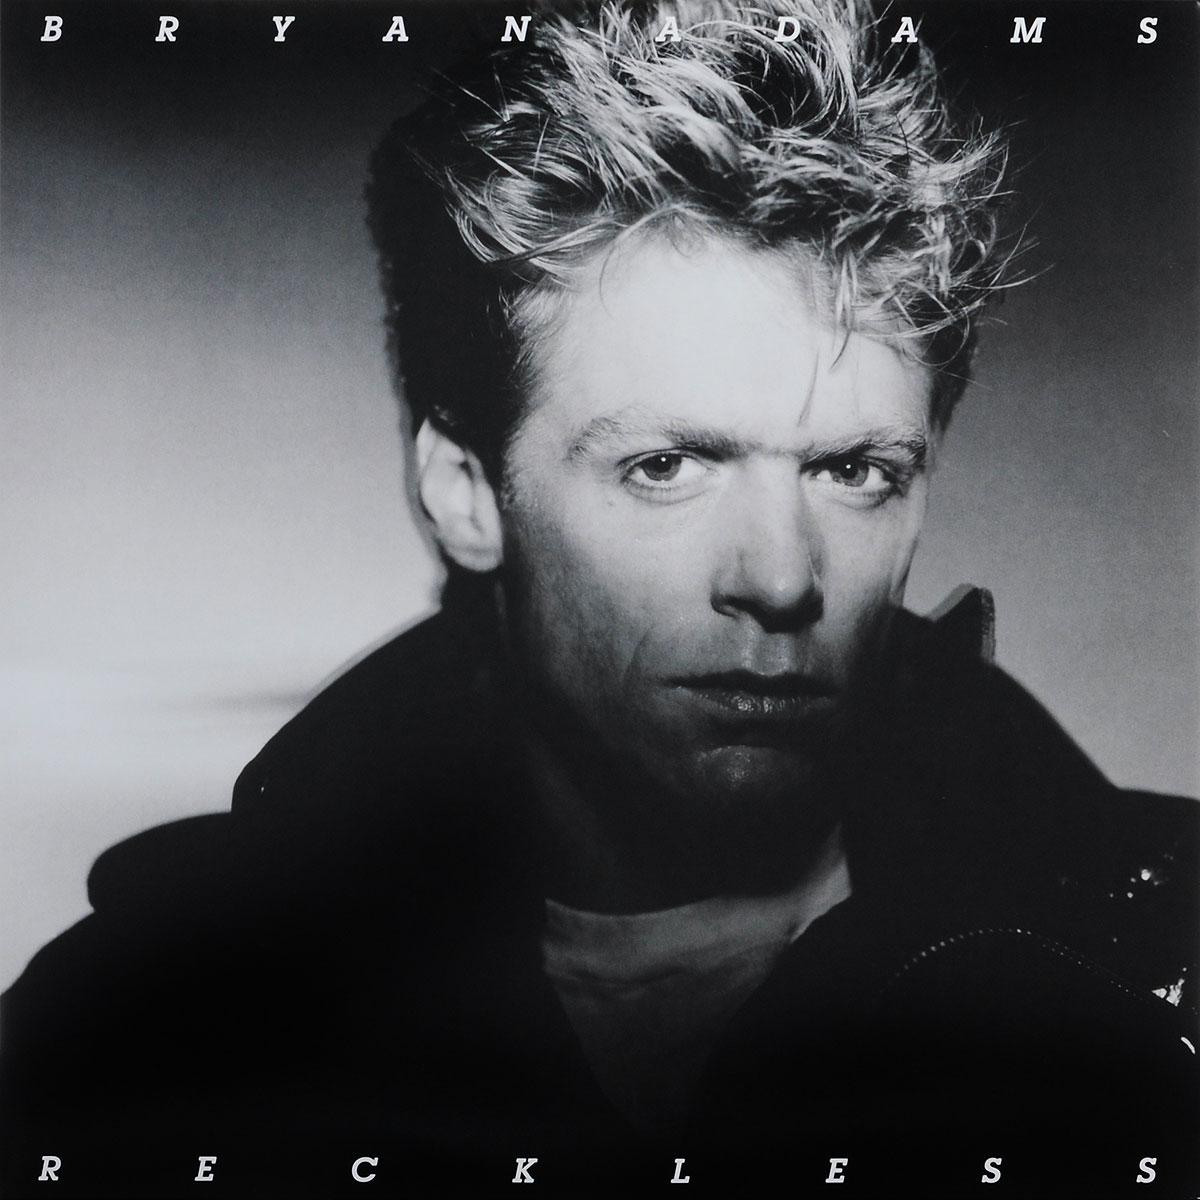 Bryan Adams. Reckless (2 LP)